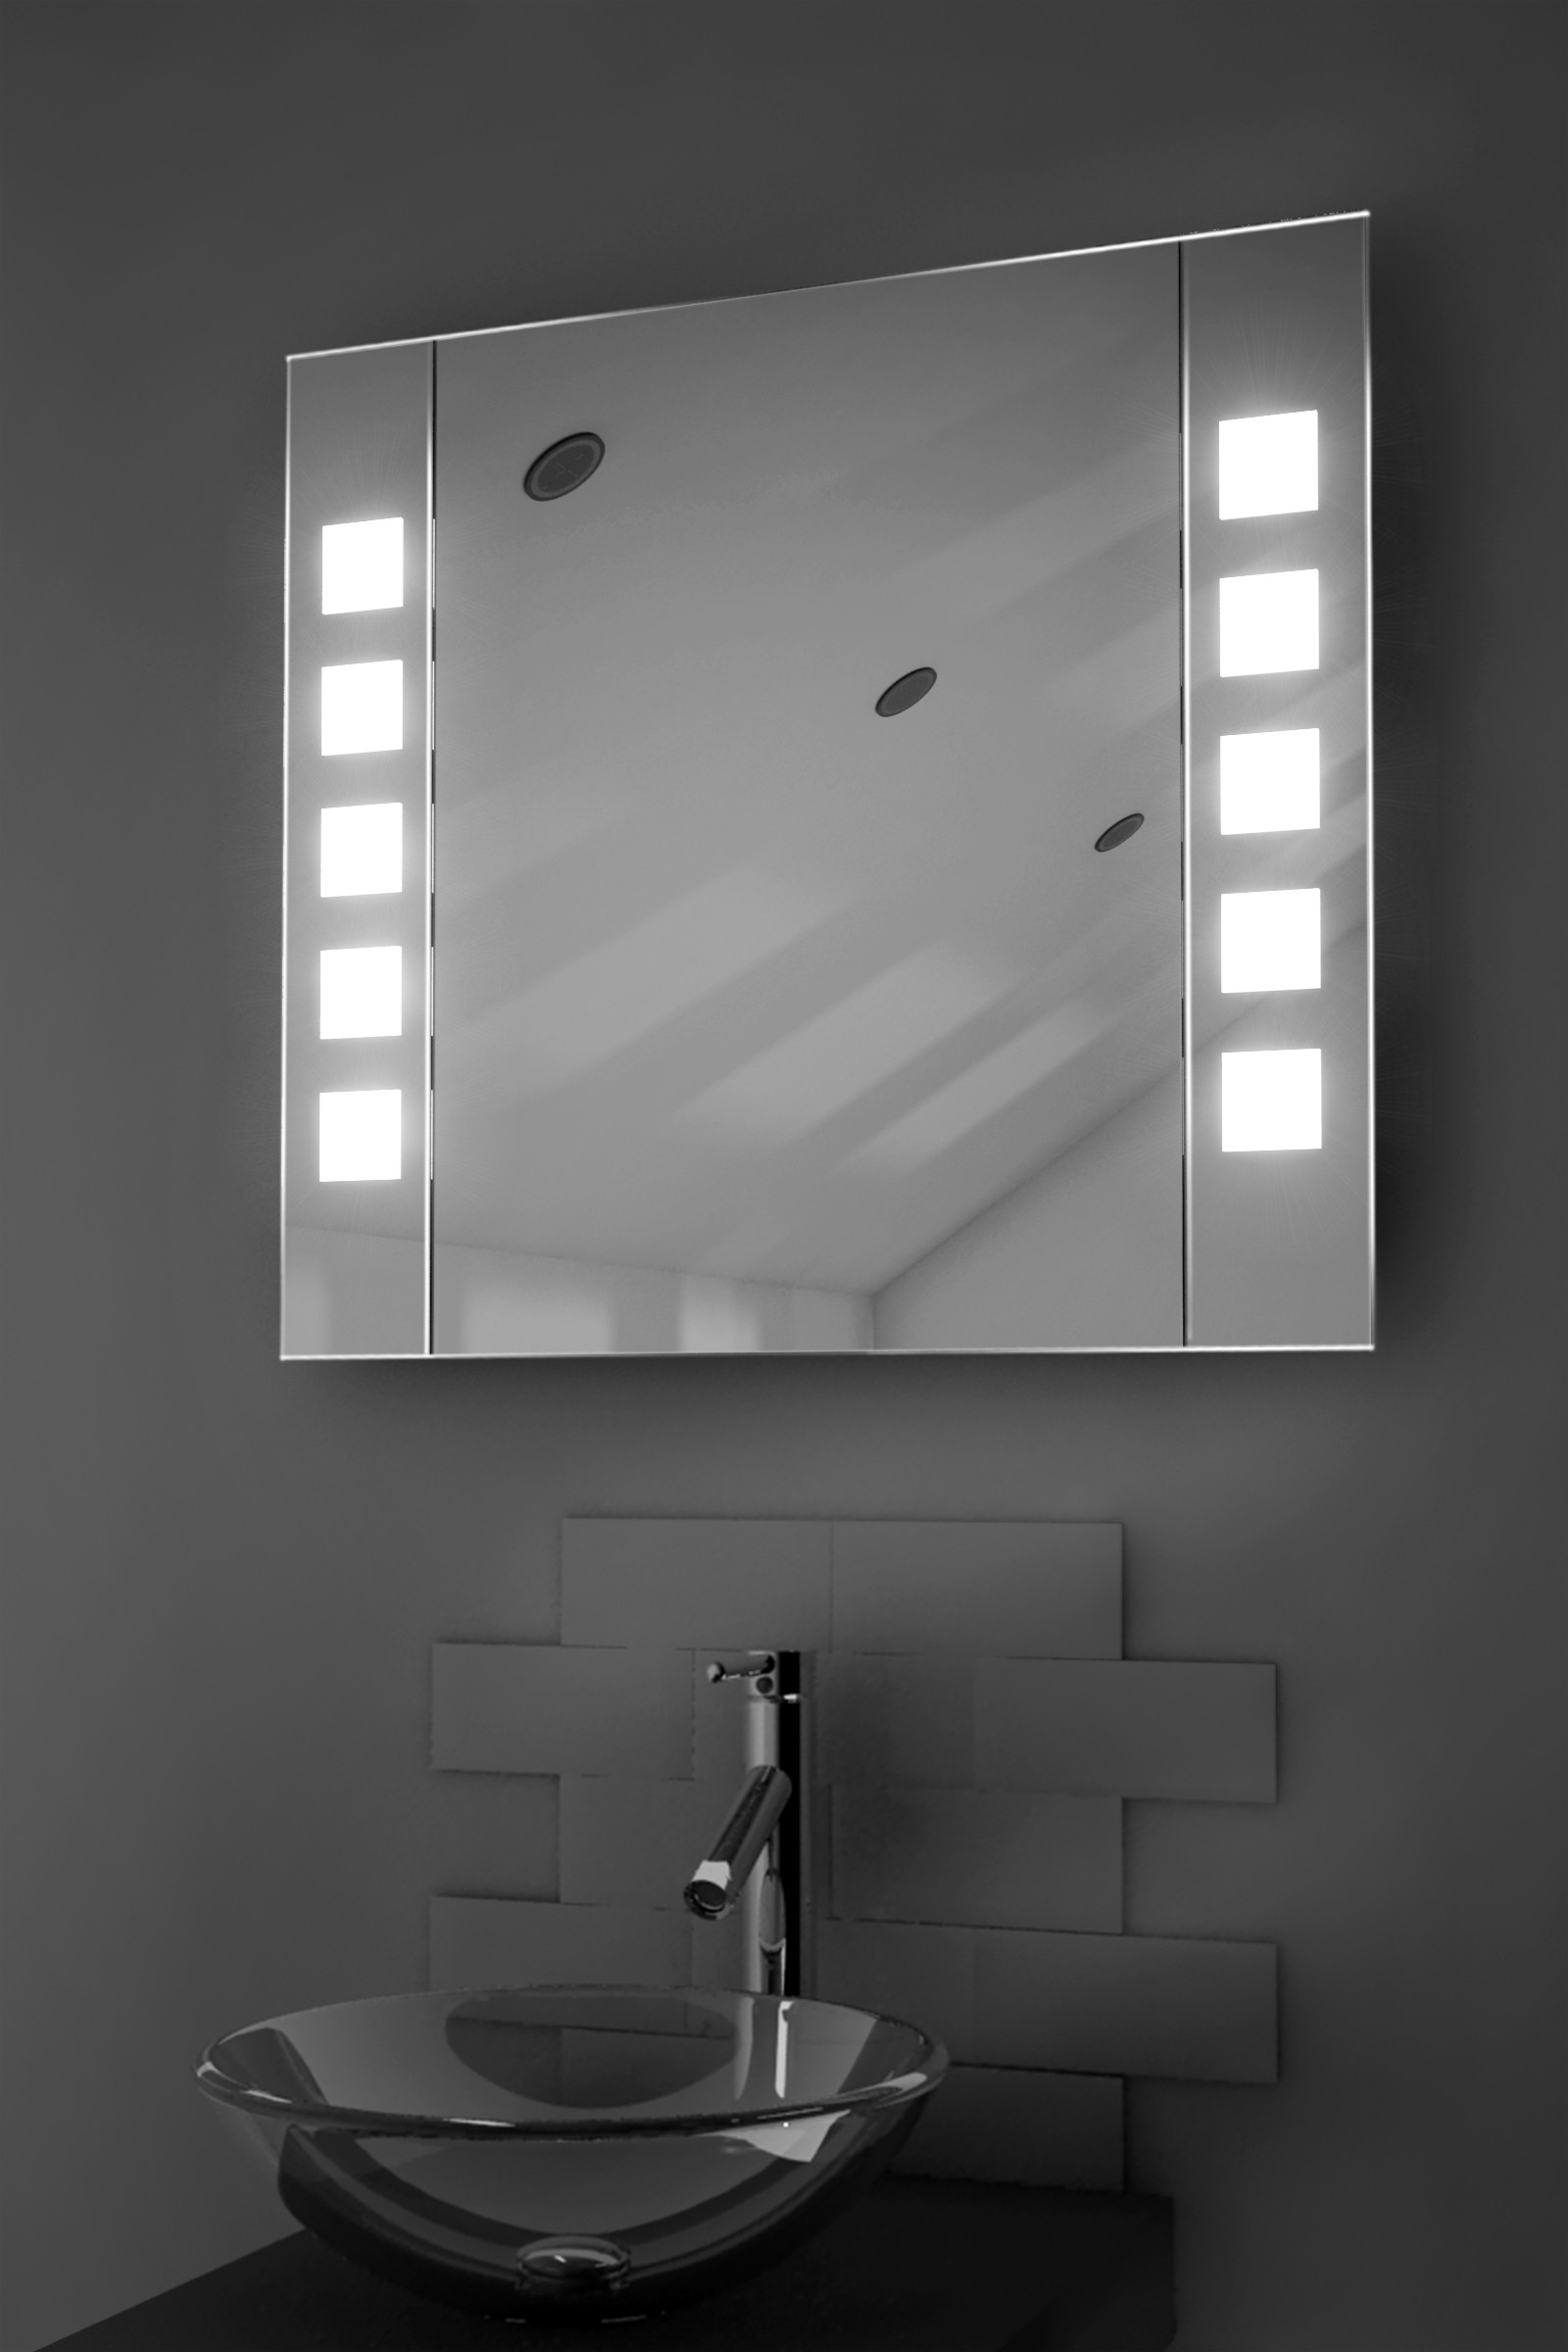 Permalink to Led Illuminated Bathroom Sensor Mirror